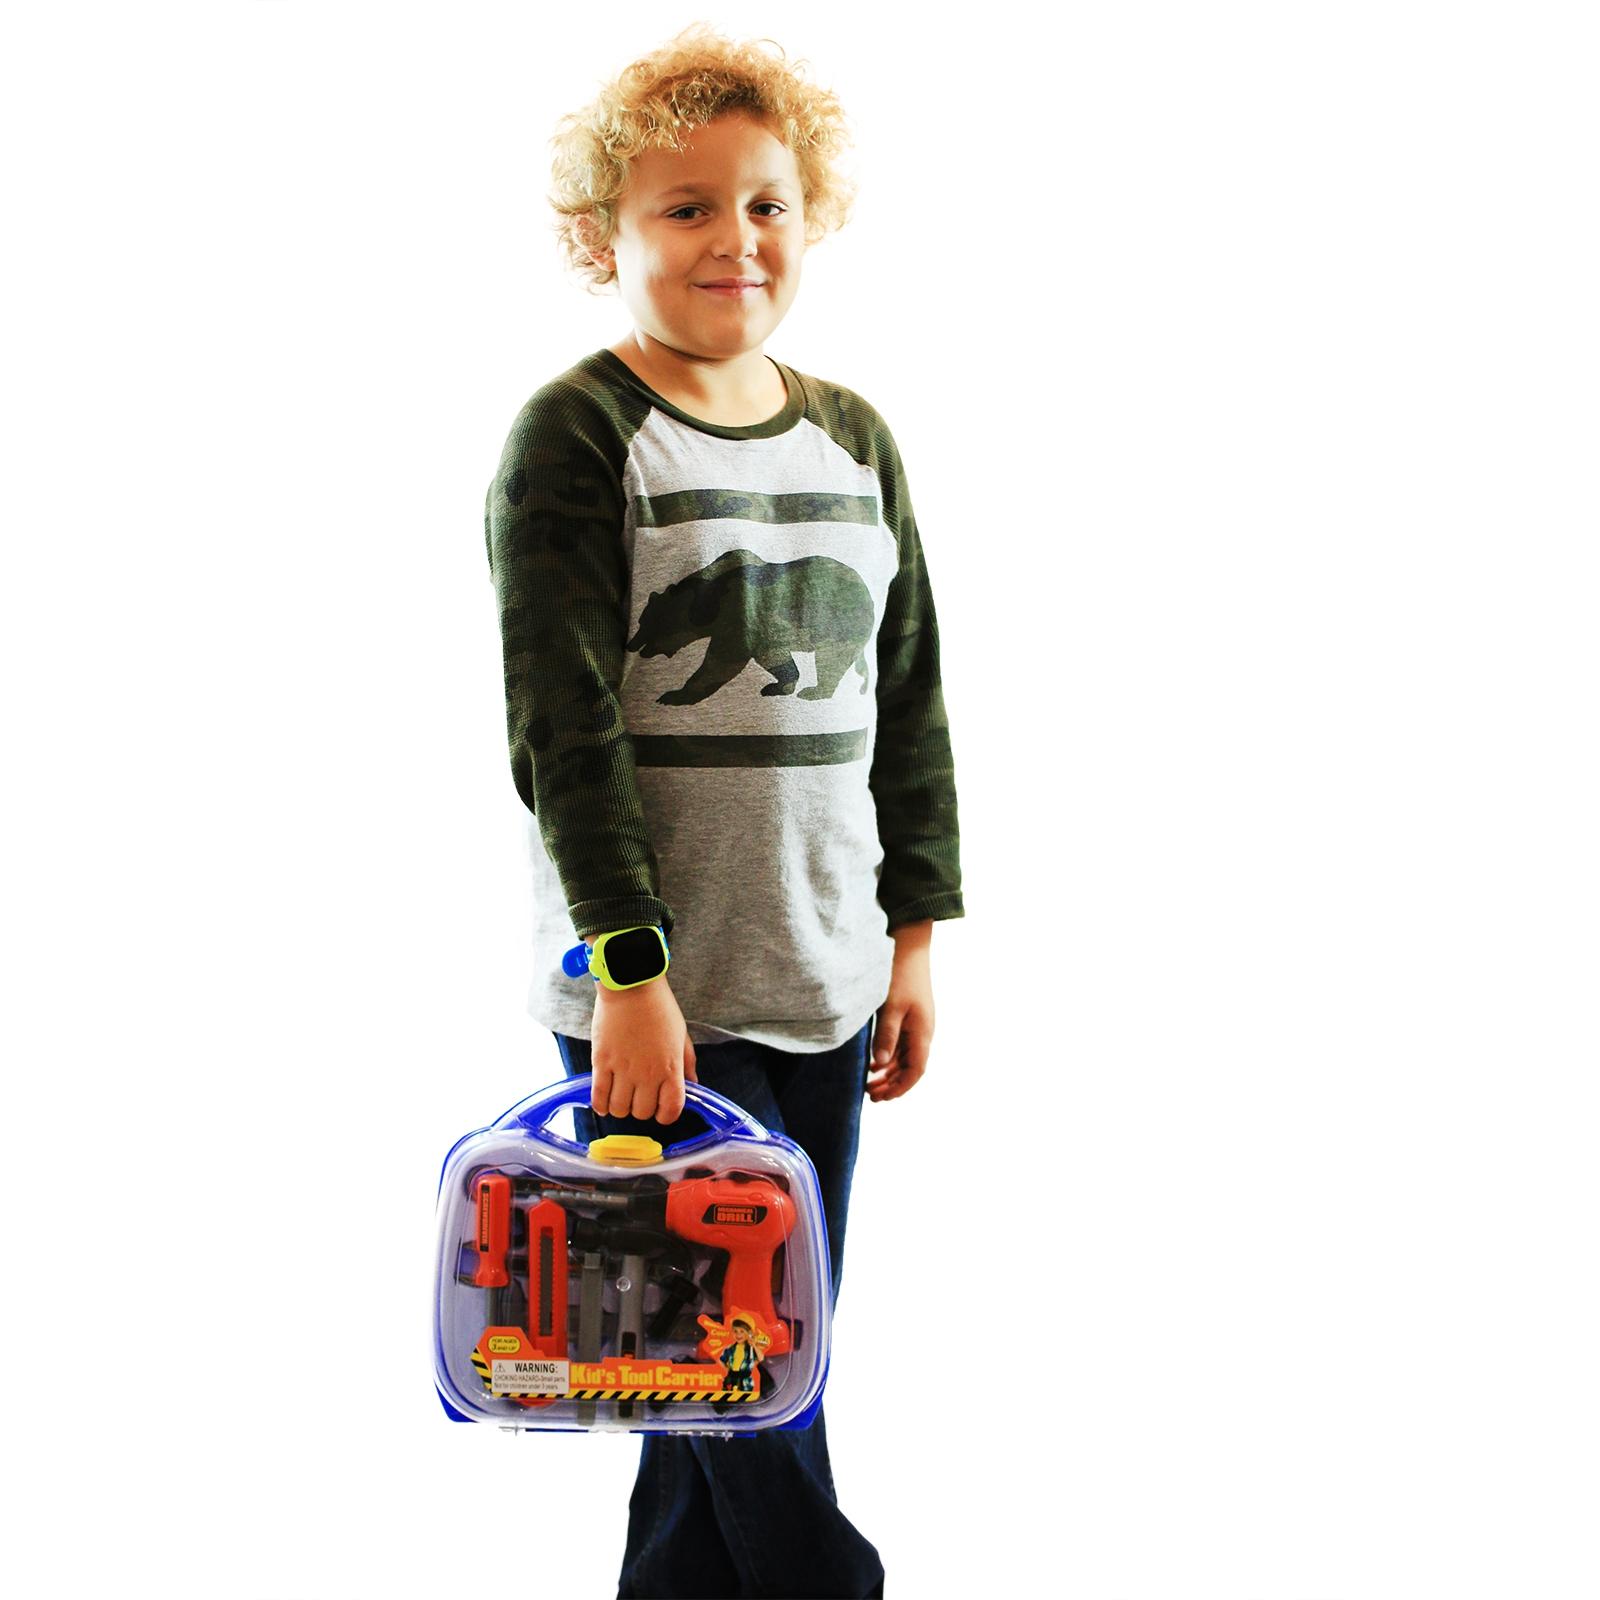 KidPlay Boys Tool Carrier Set Pretend Play Just Like Dad Toolbox - Blue